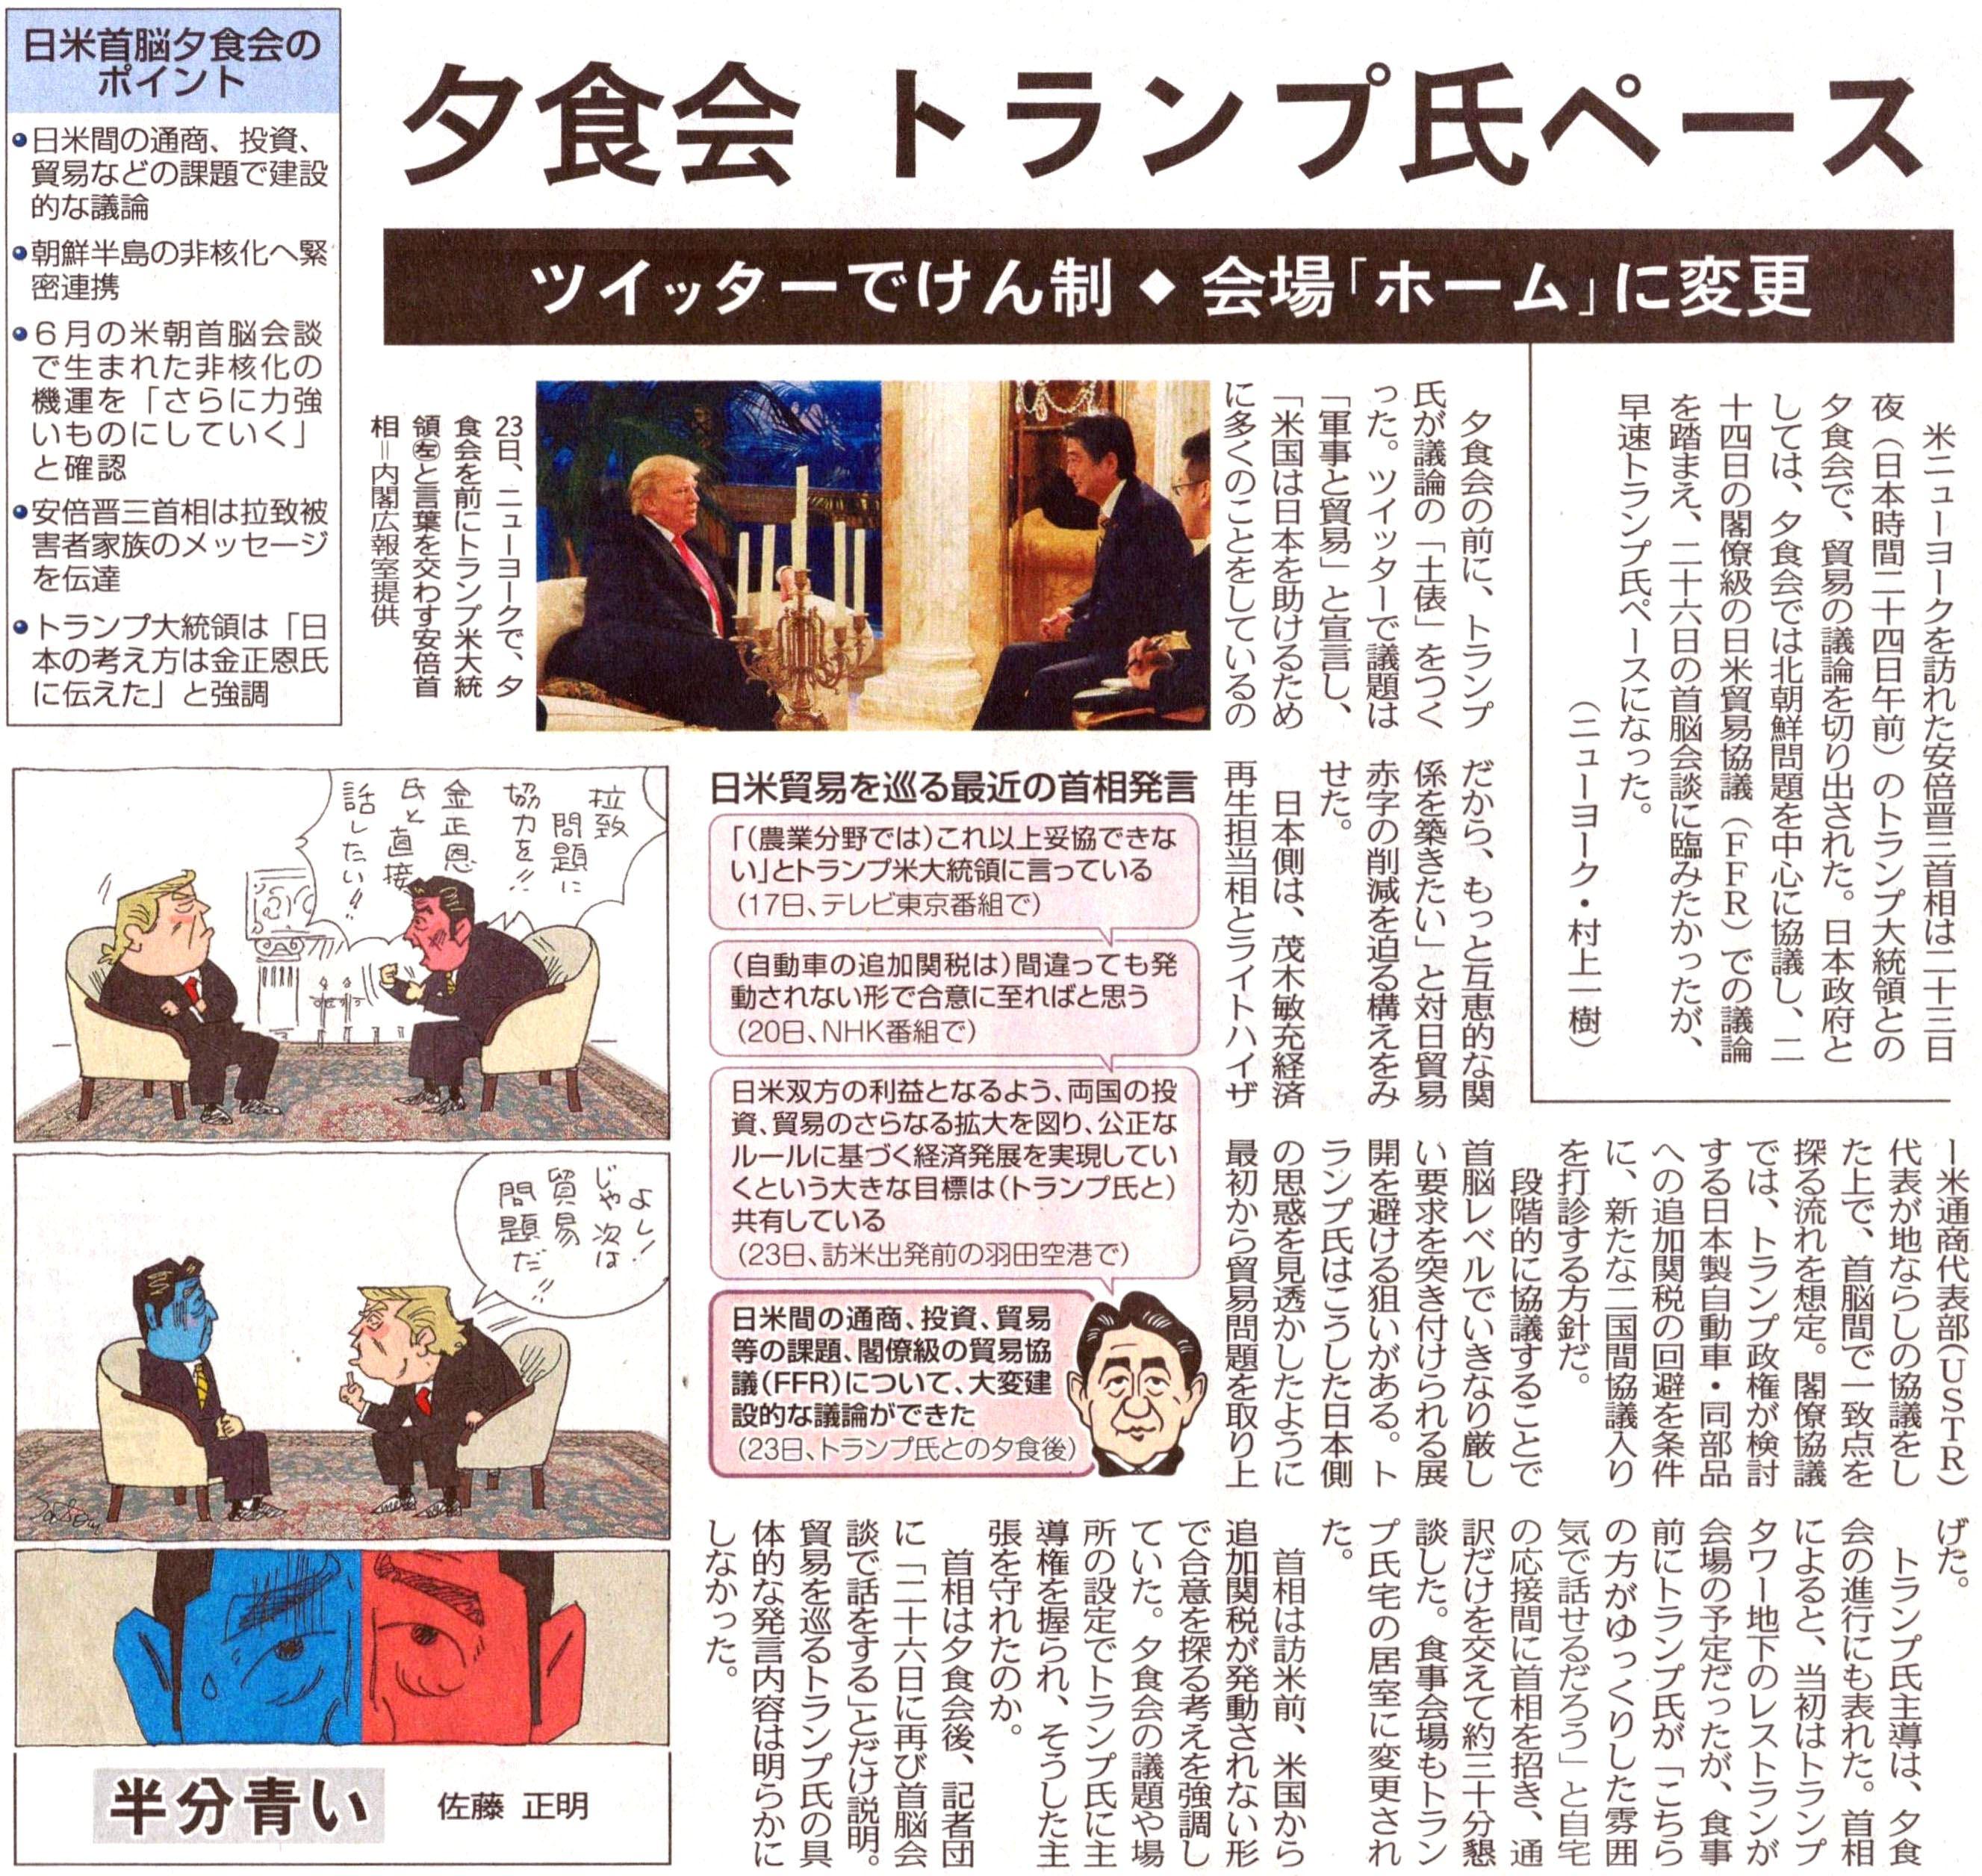 https://img.atwikiimg.com/www45.atwiki.jp/jippensha/attach/93/7638/86_2018-09-25.jpg